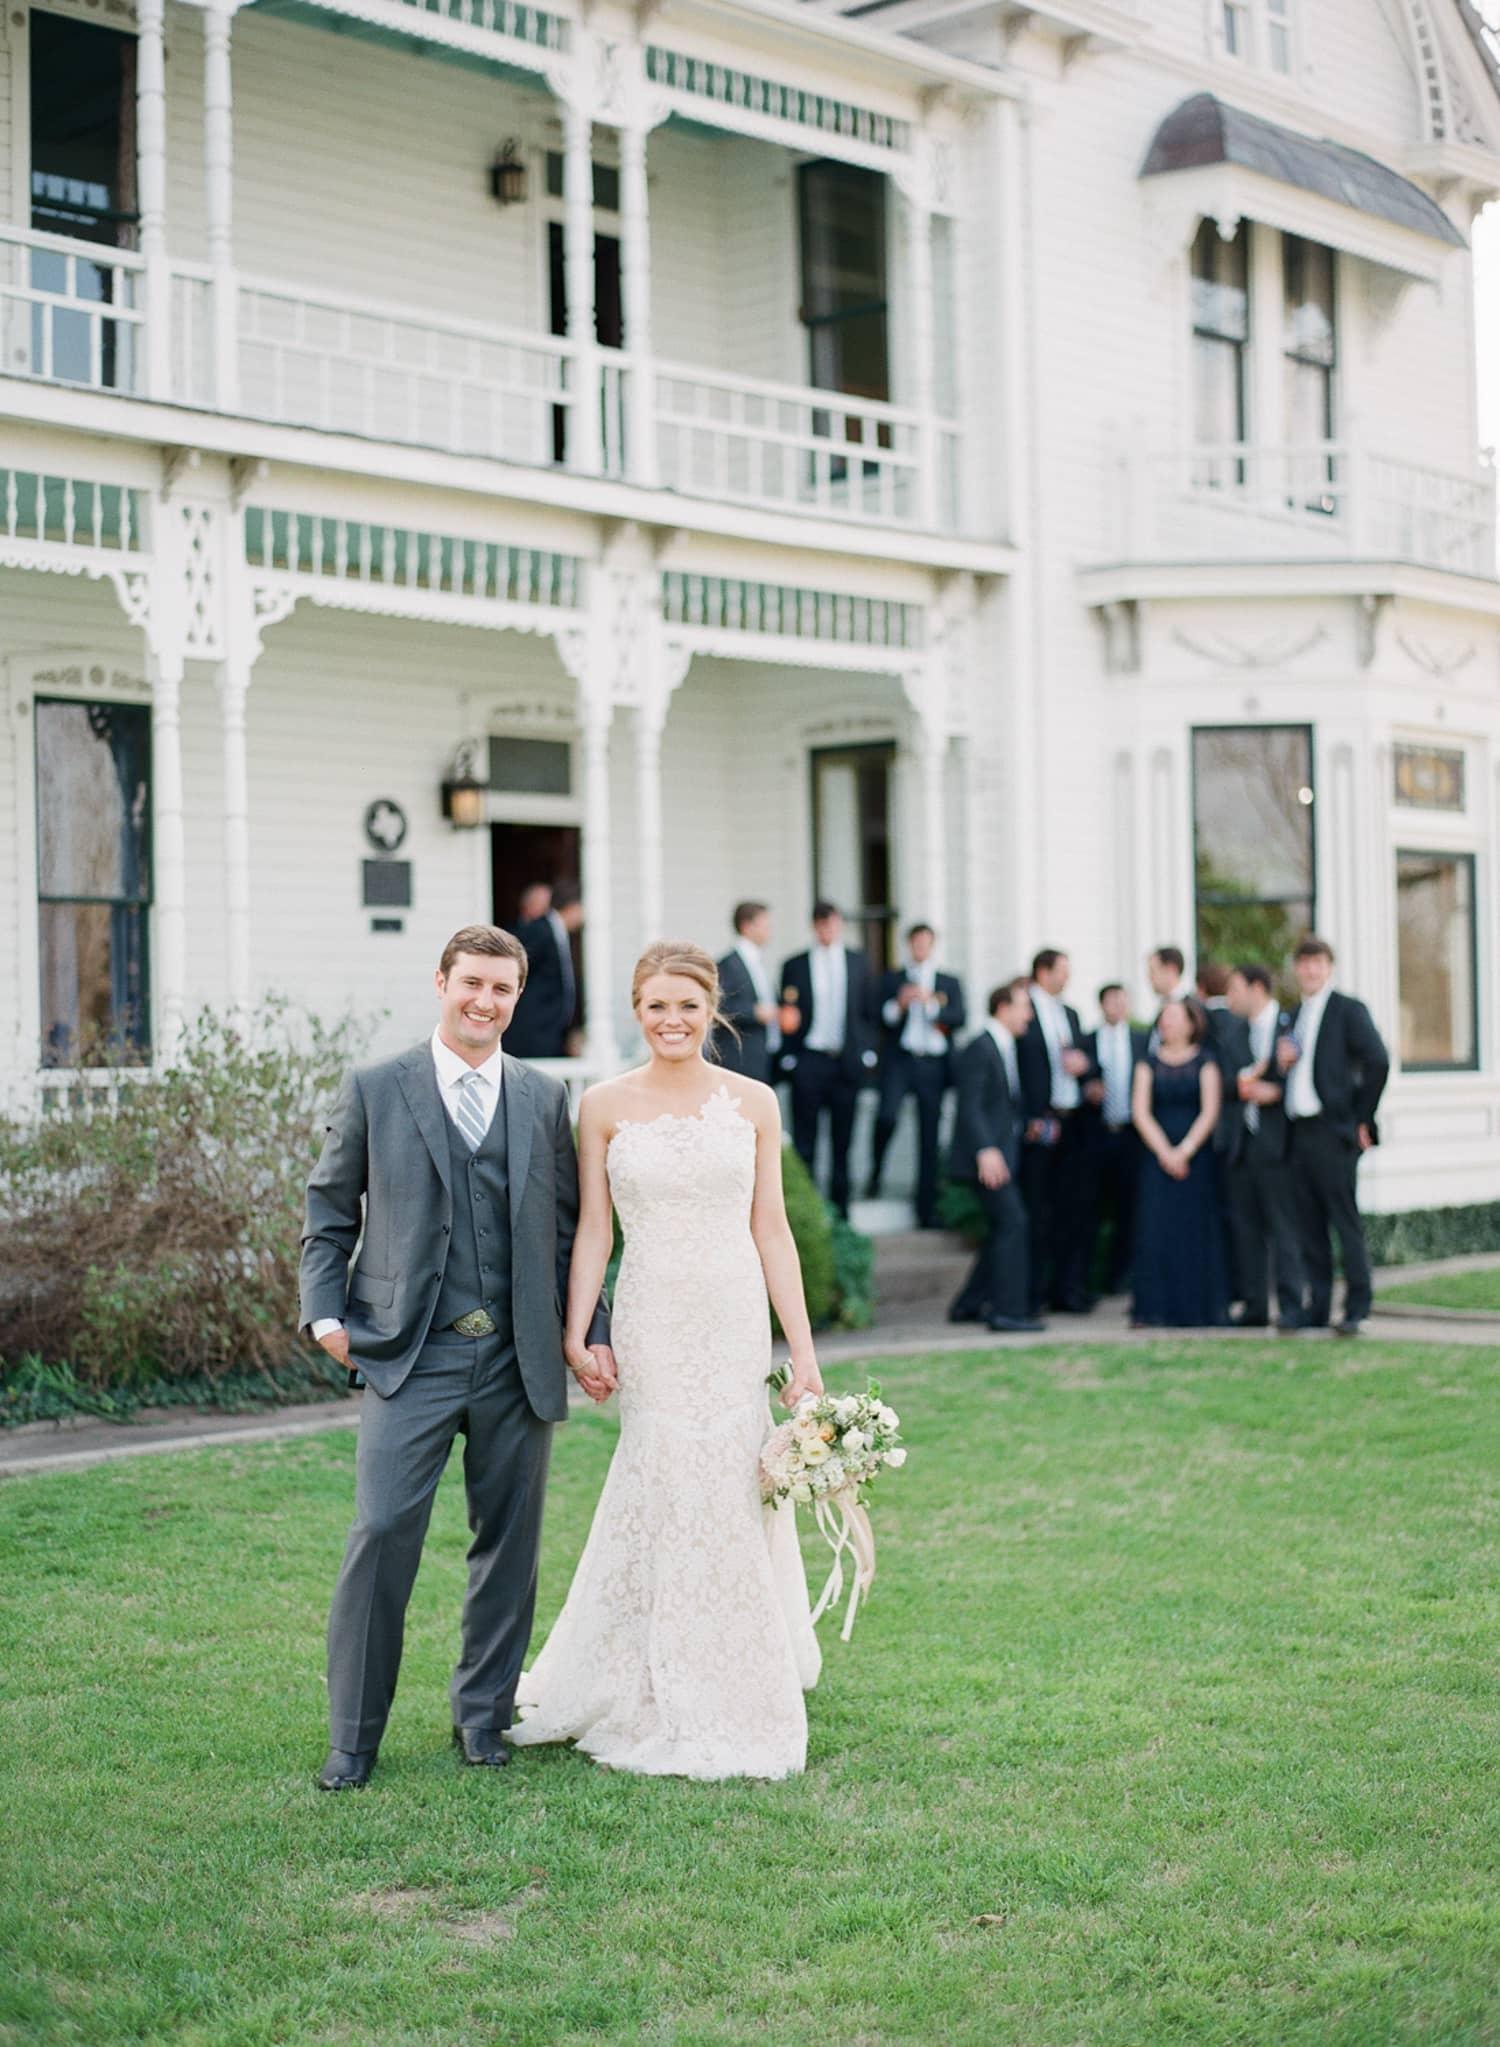 barr-mansion-wedding-42.jpg